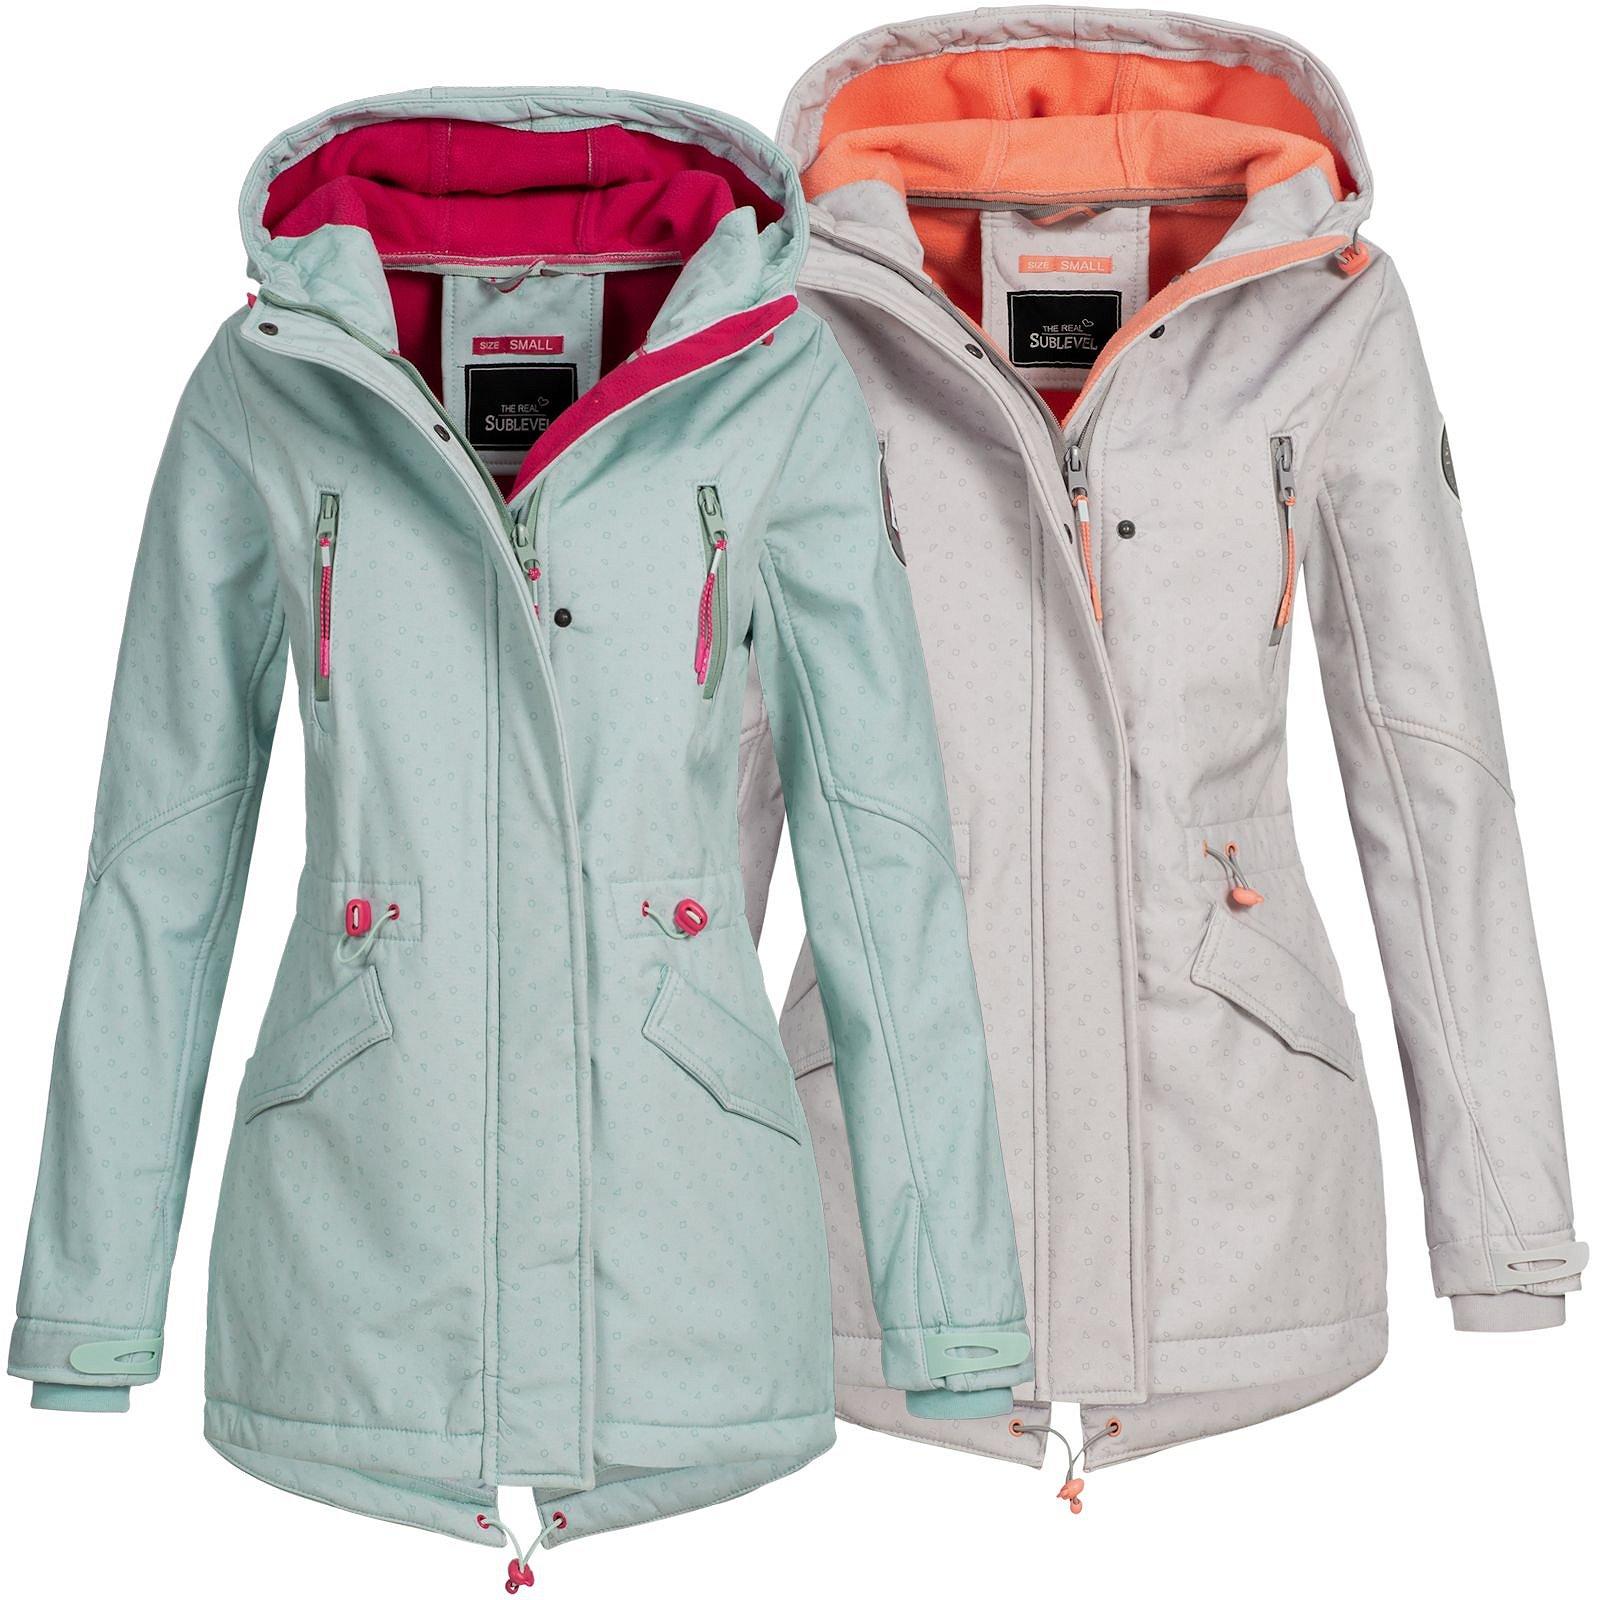 Details zu Sublevel Damen Jacke Softshelljacke Mantel Outdoor Damenjacke Parka LSL 368